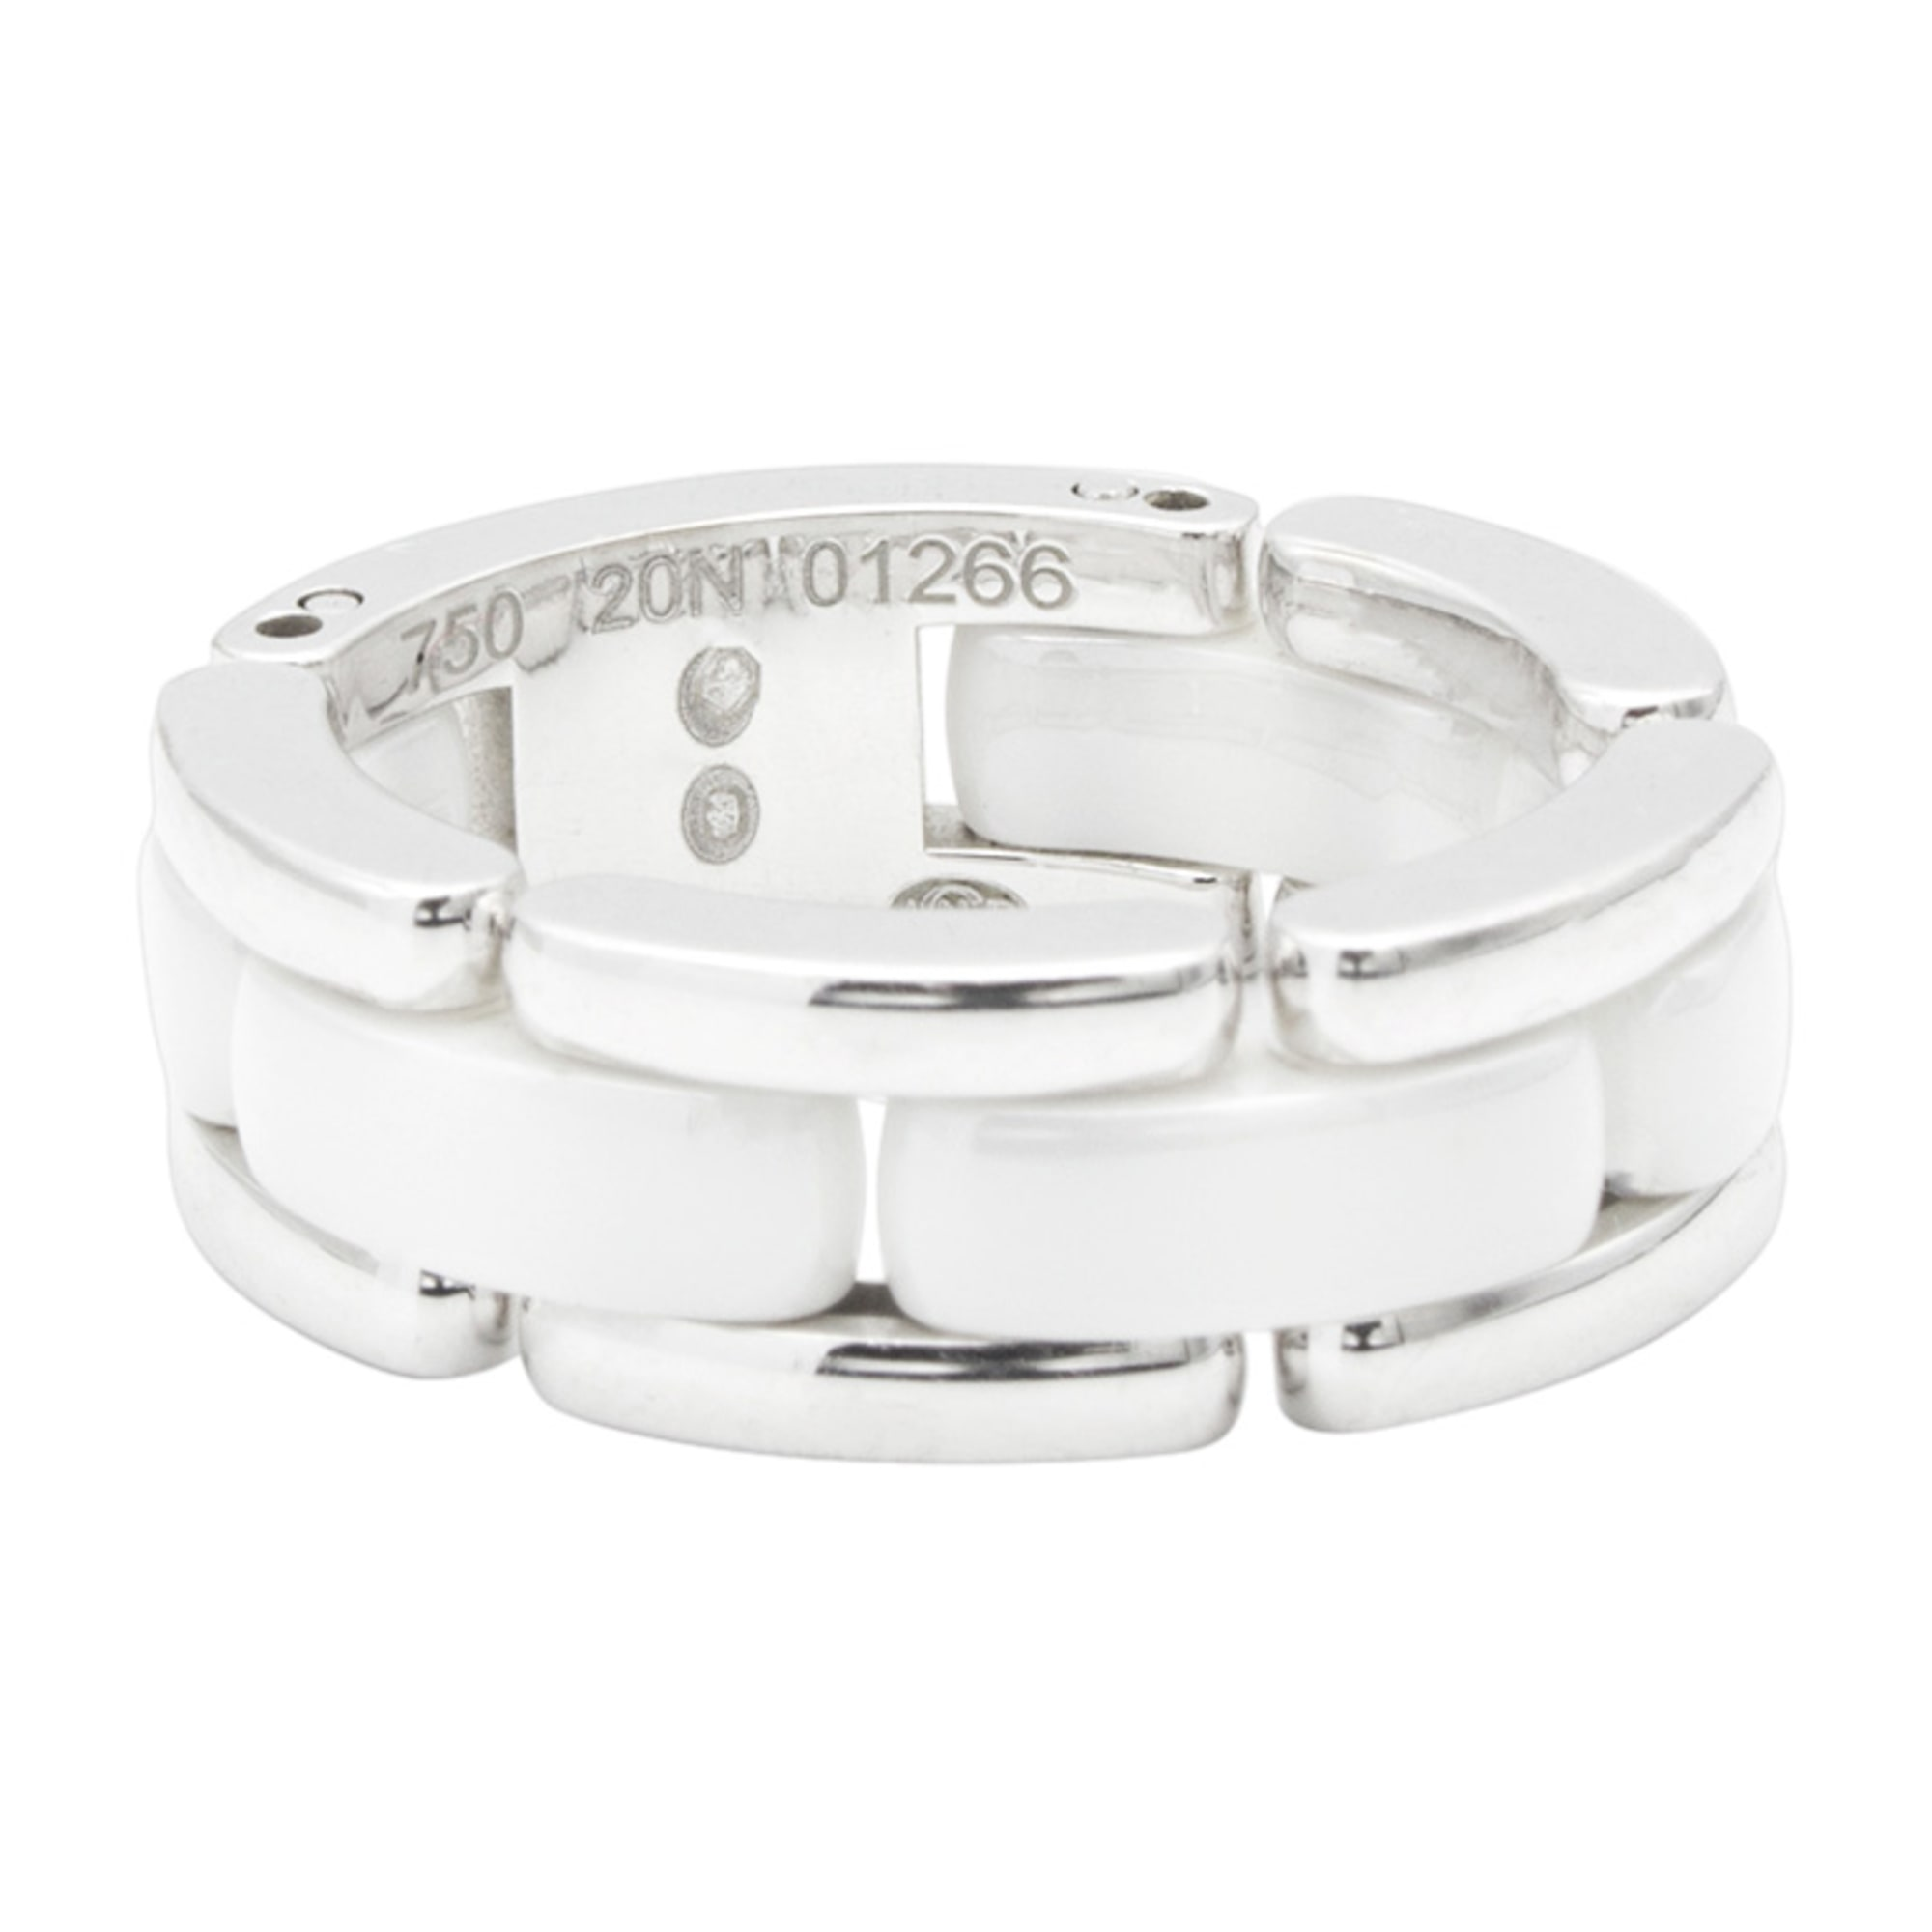 Ring CHANEL Ultra White, off-white, ecru